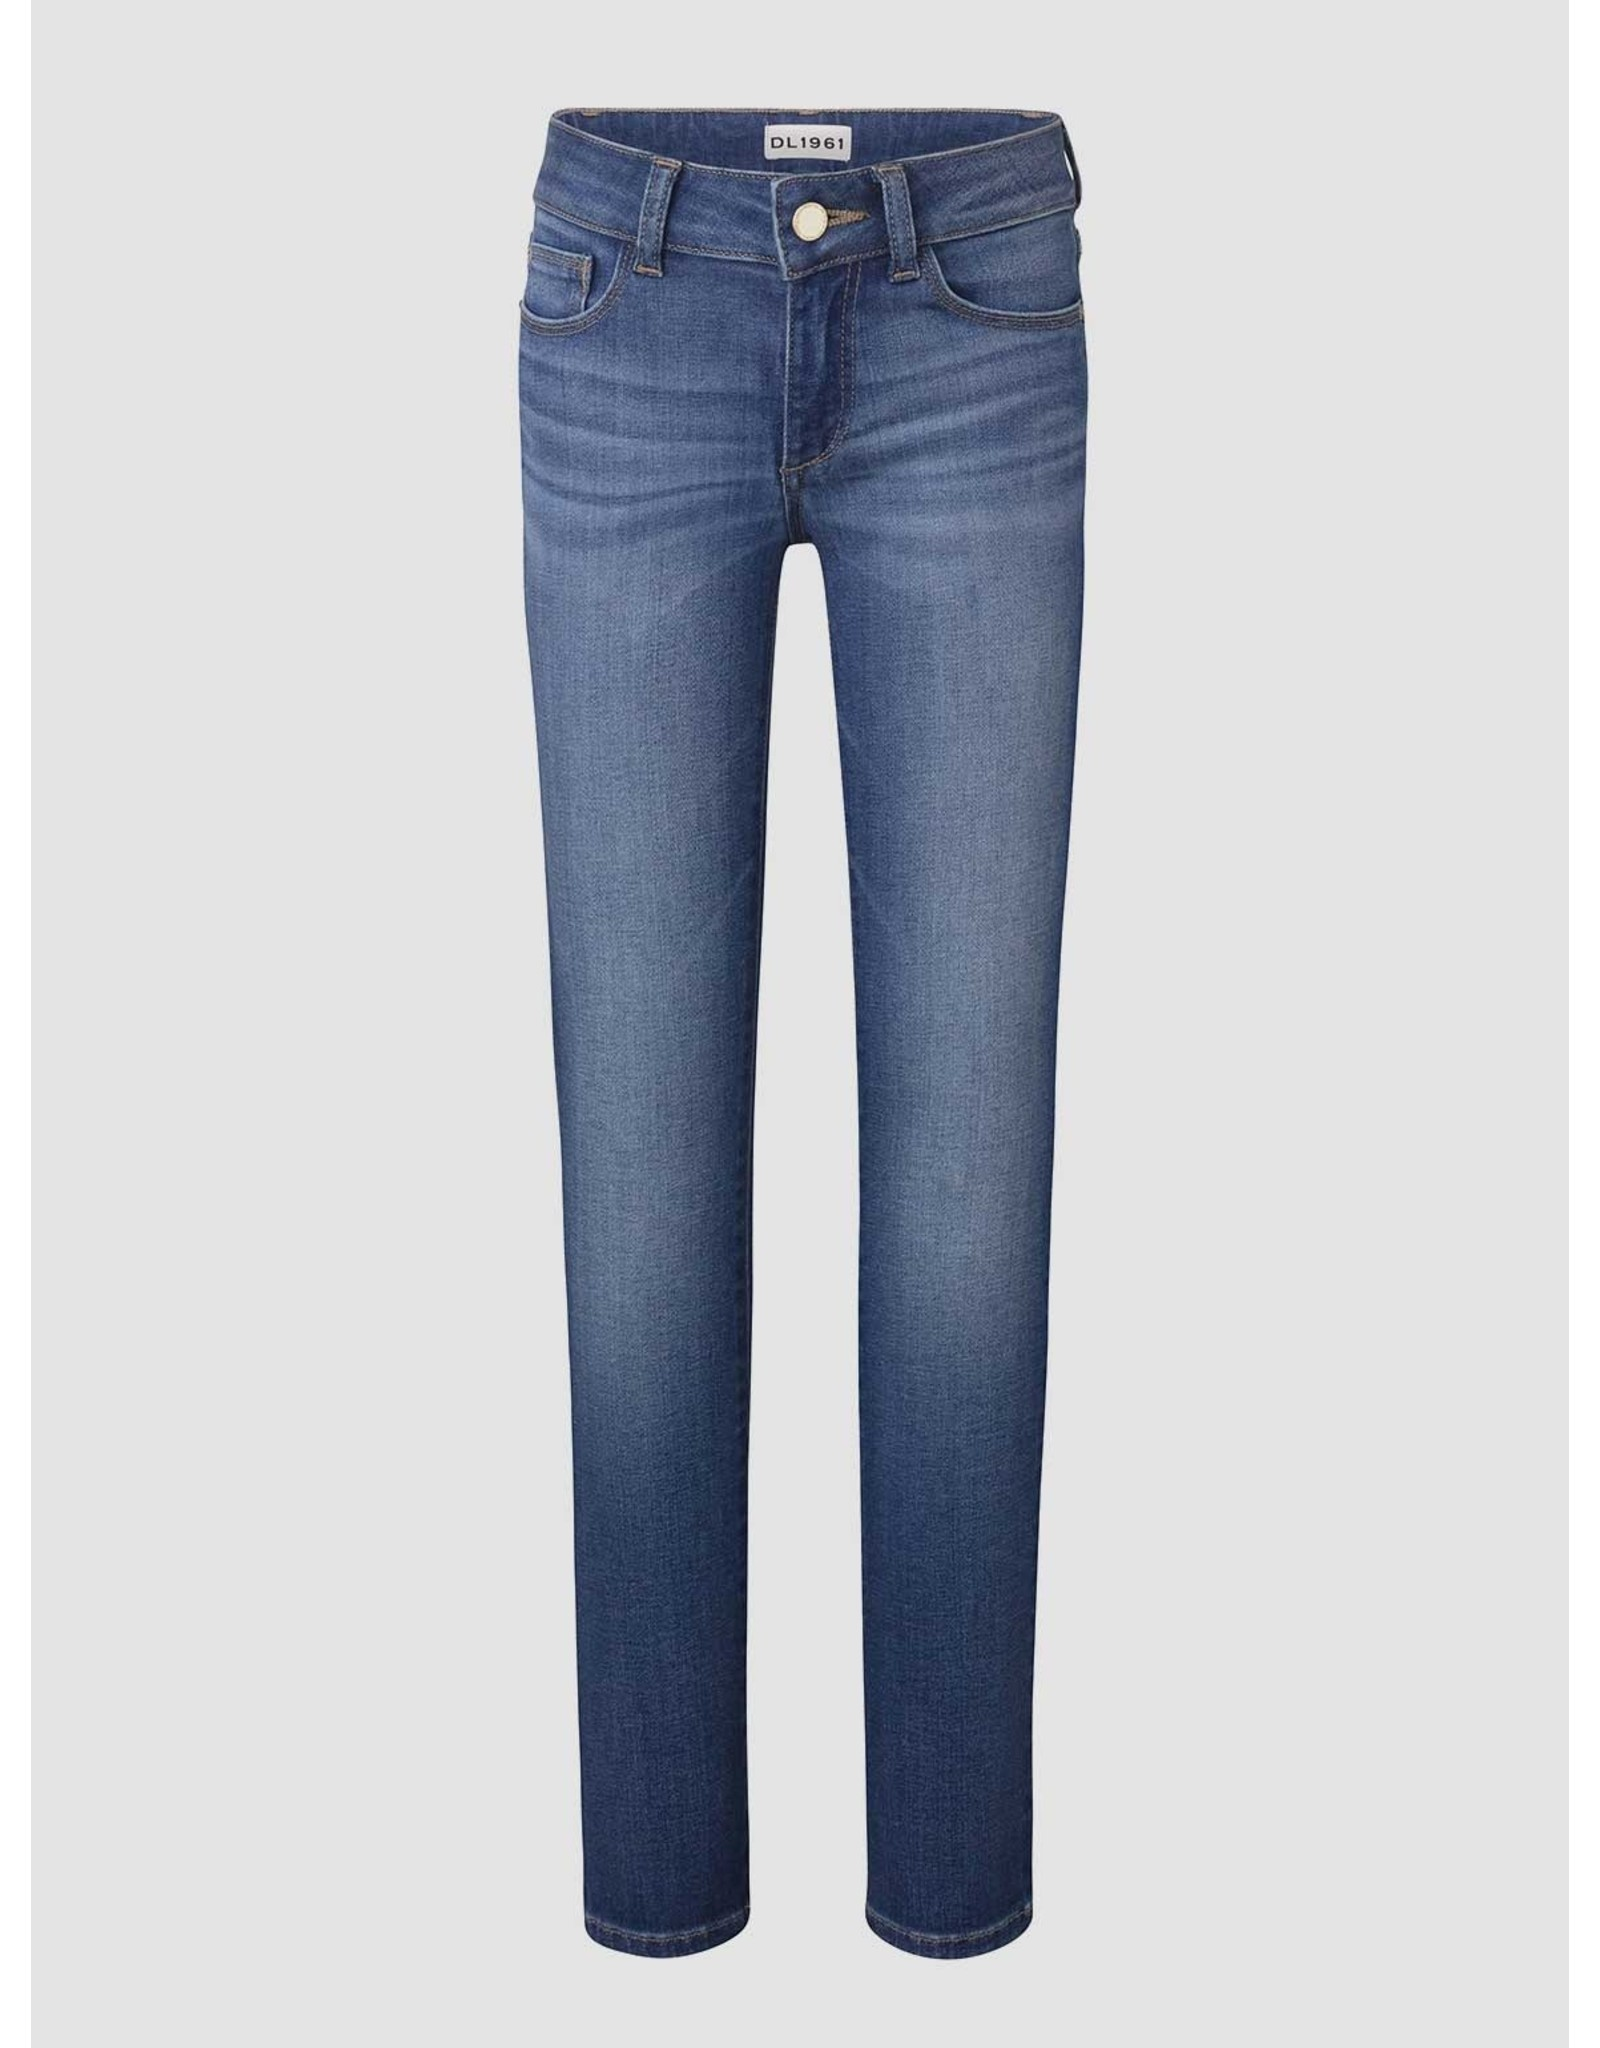 Chloe Girls Skinny Jean